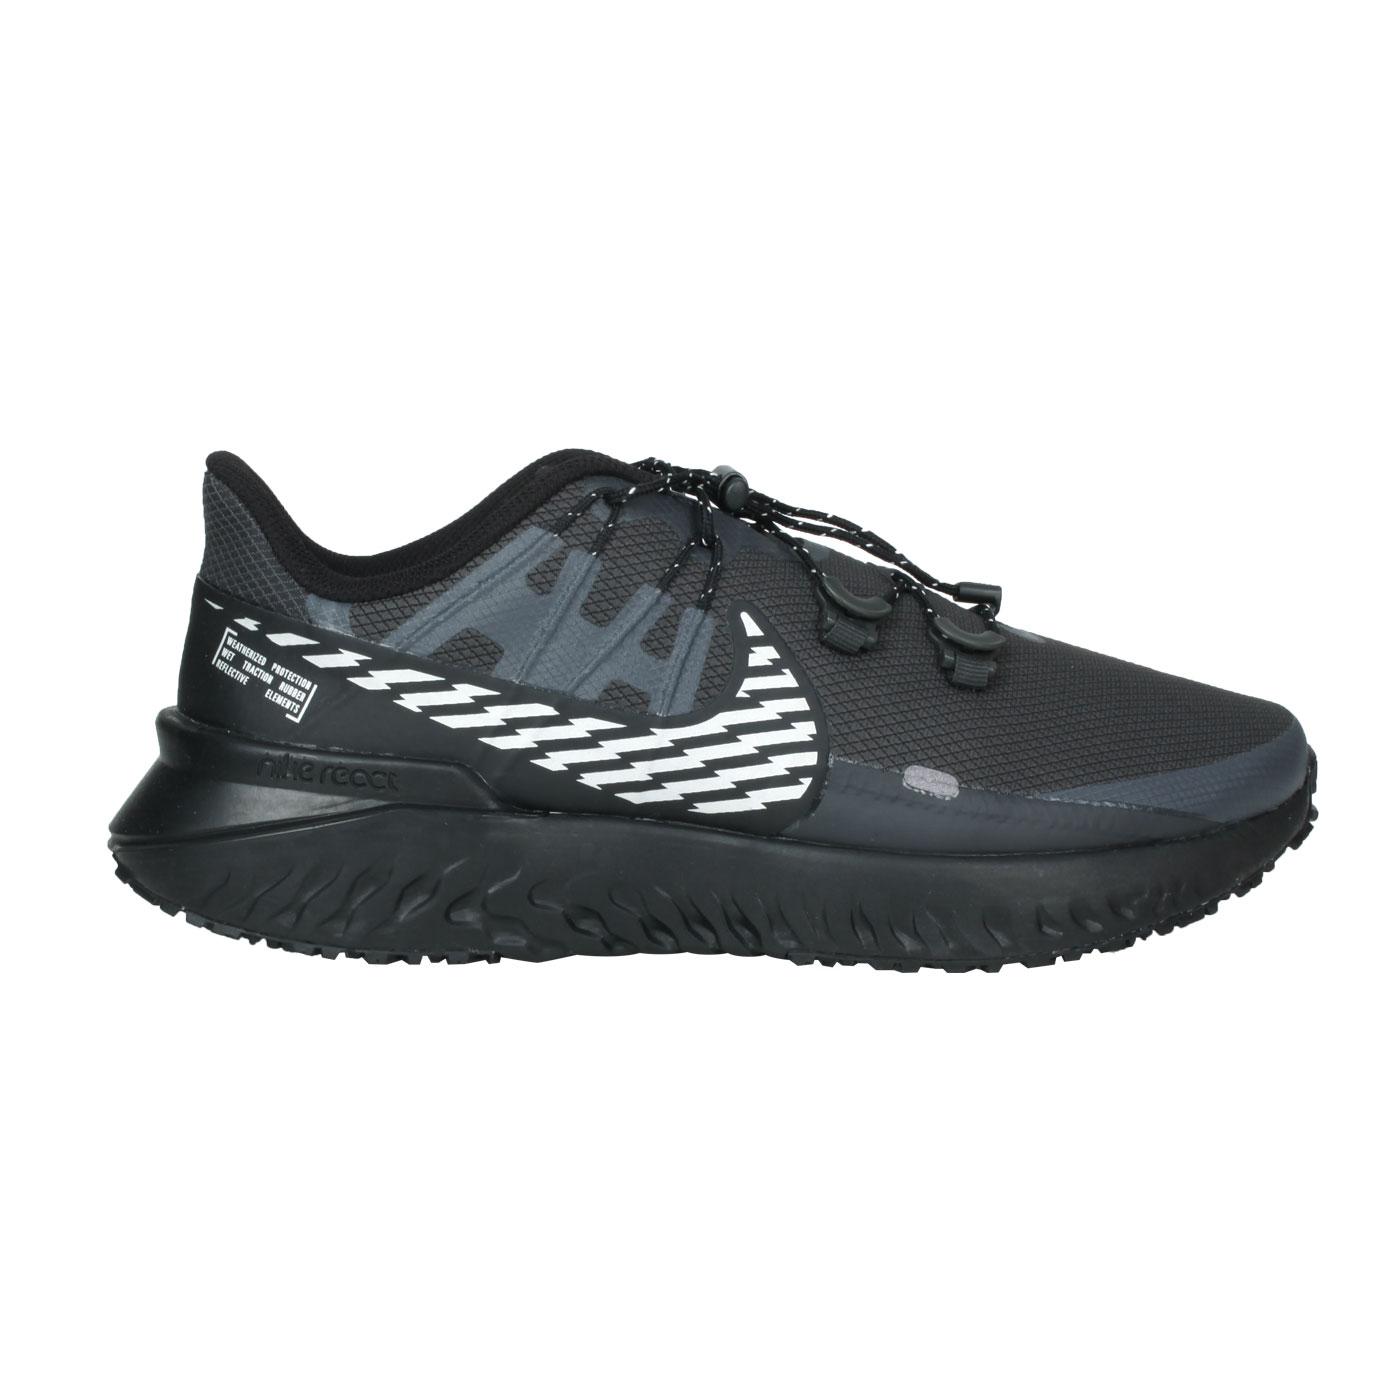 NIKE 男款休閒運動鞋  @LEGEND REACT 3 SHIELD@CU3864002 - 黑灰白